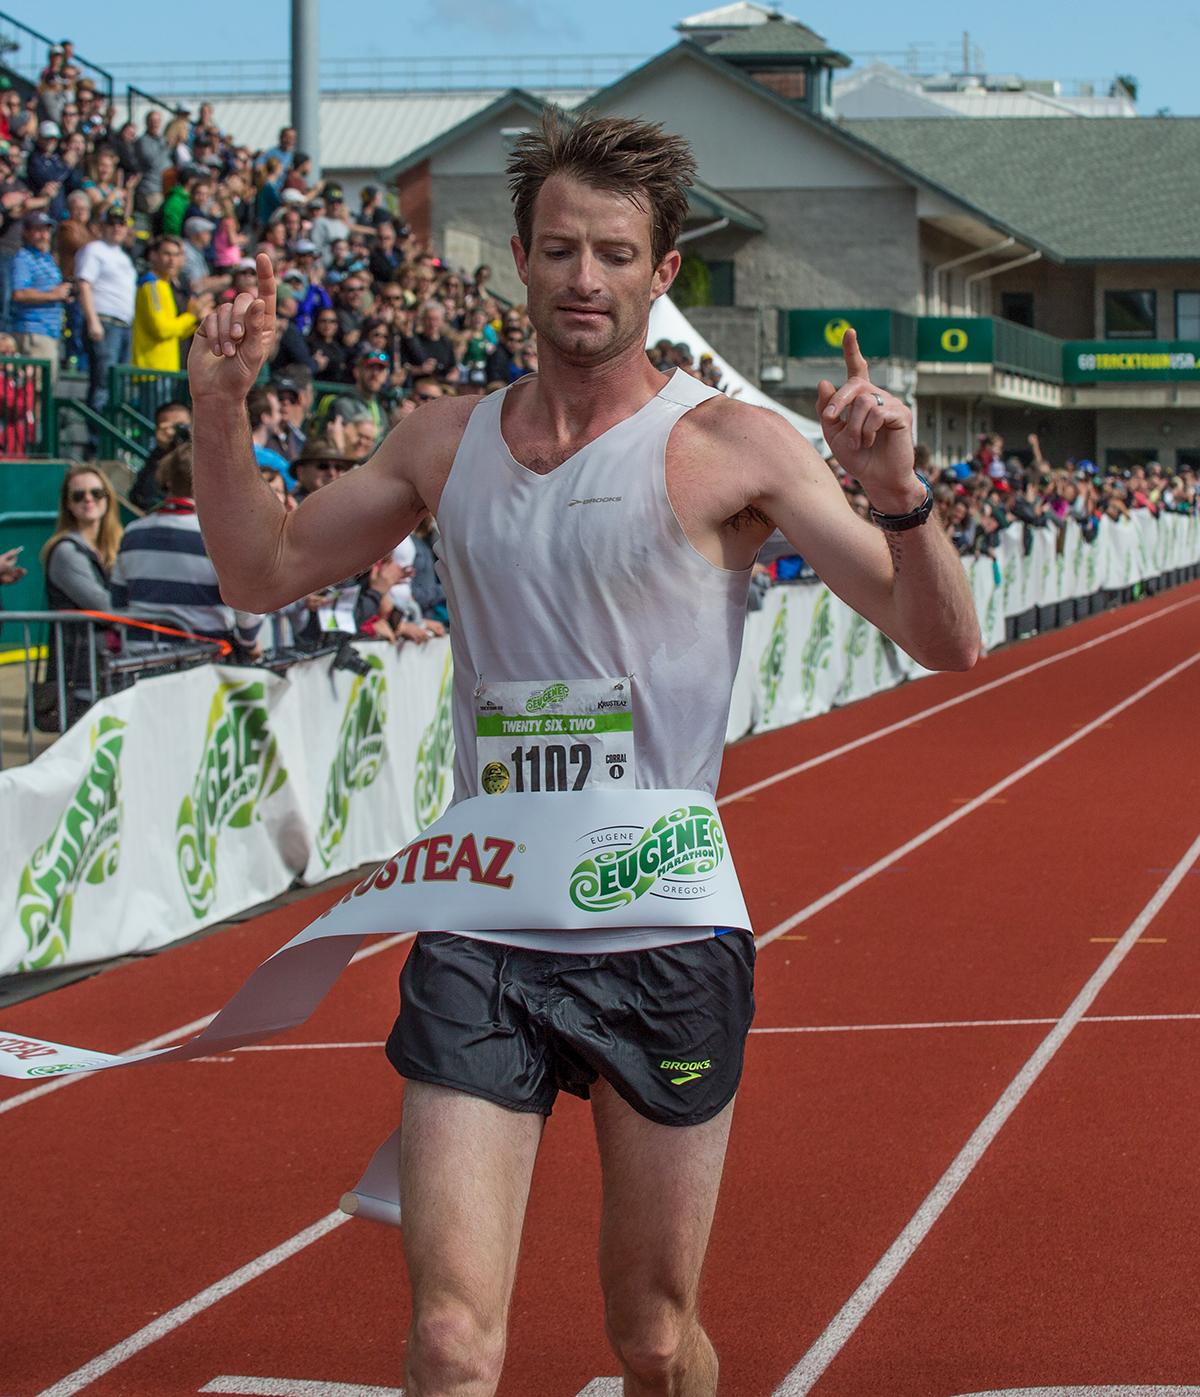 Photos: Runners Strive For Finish Line In 2017 Eugene